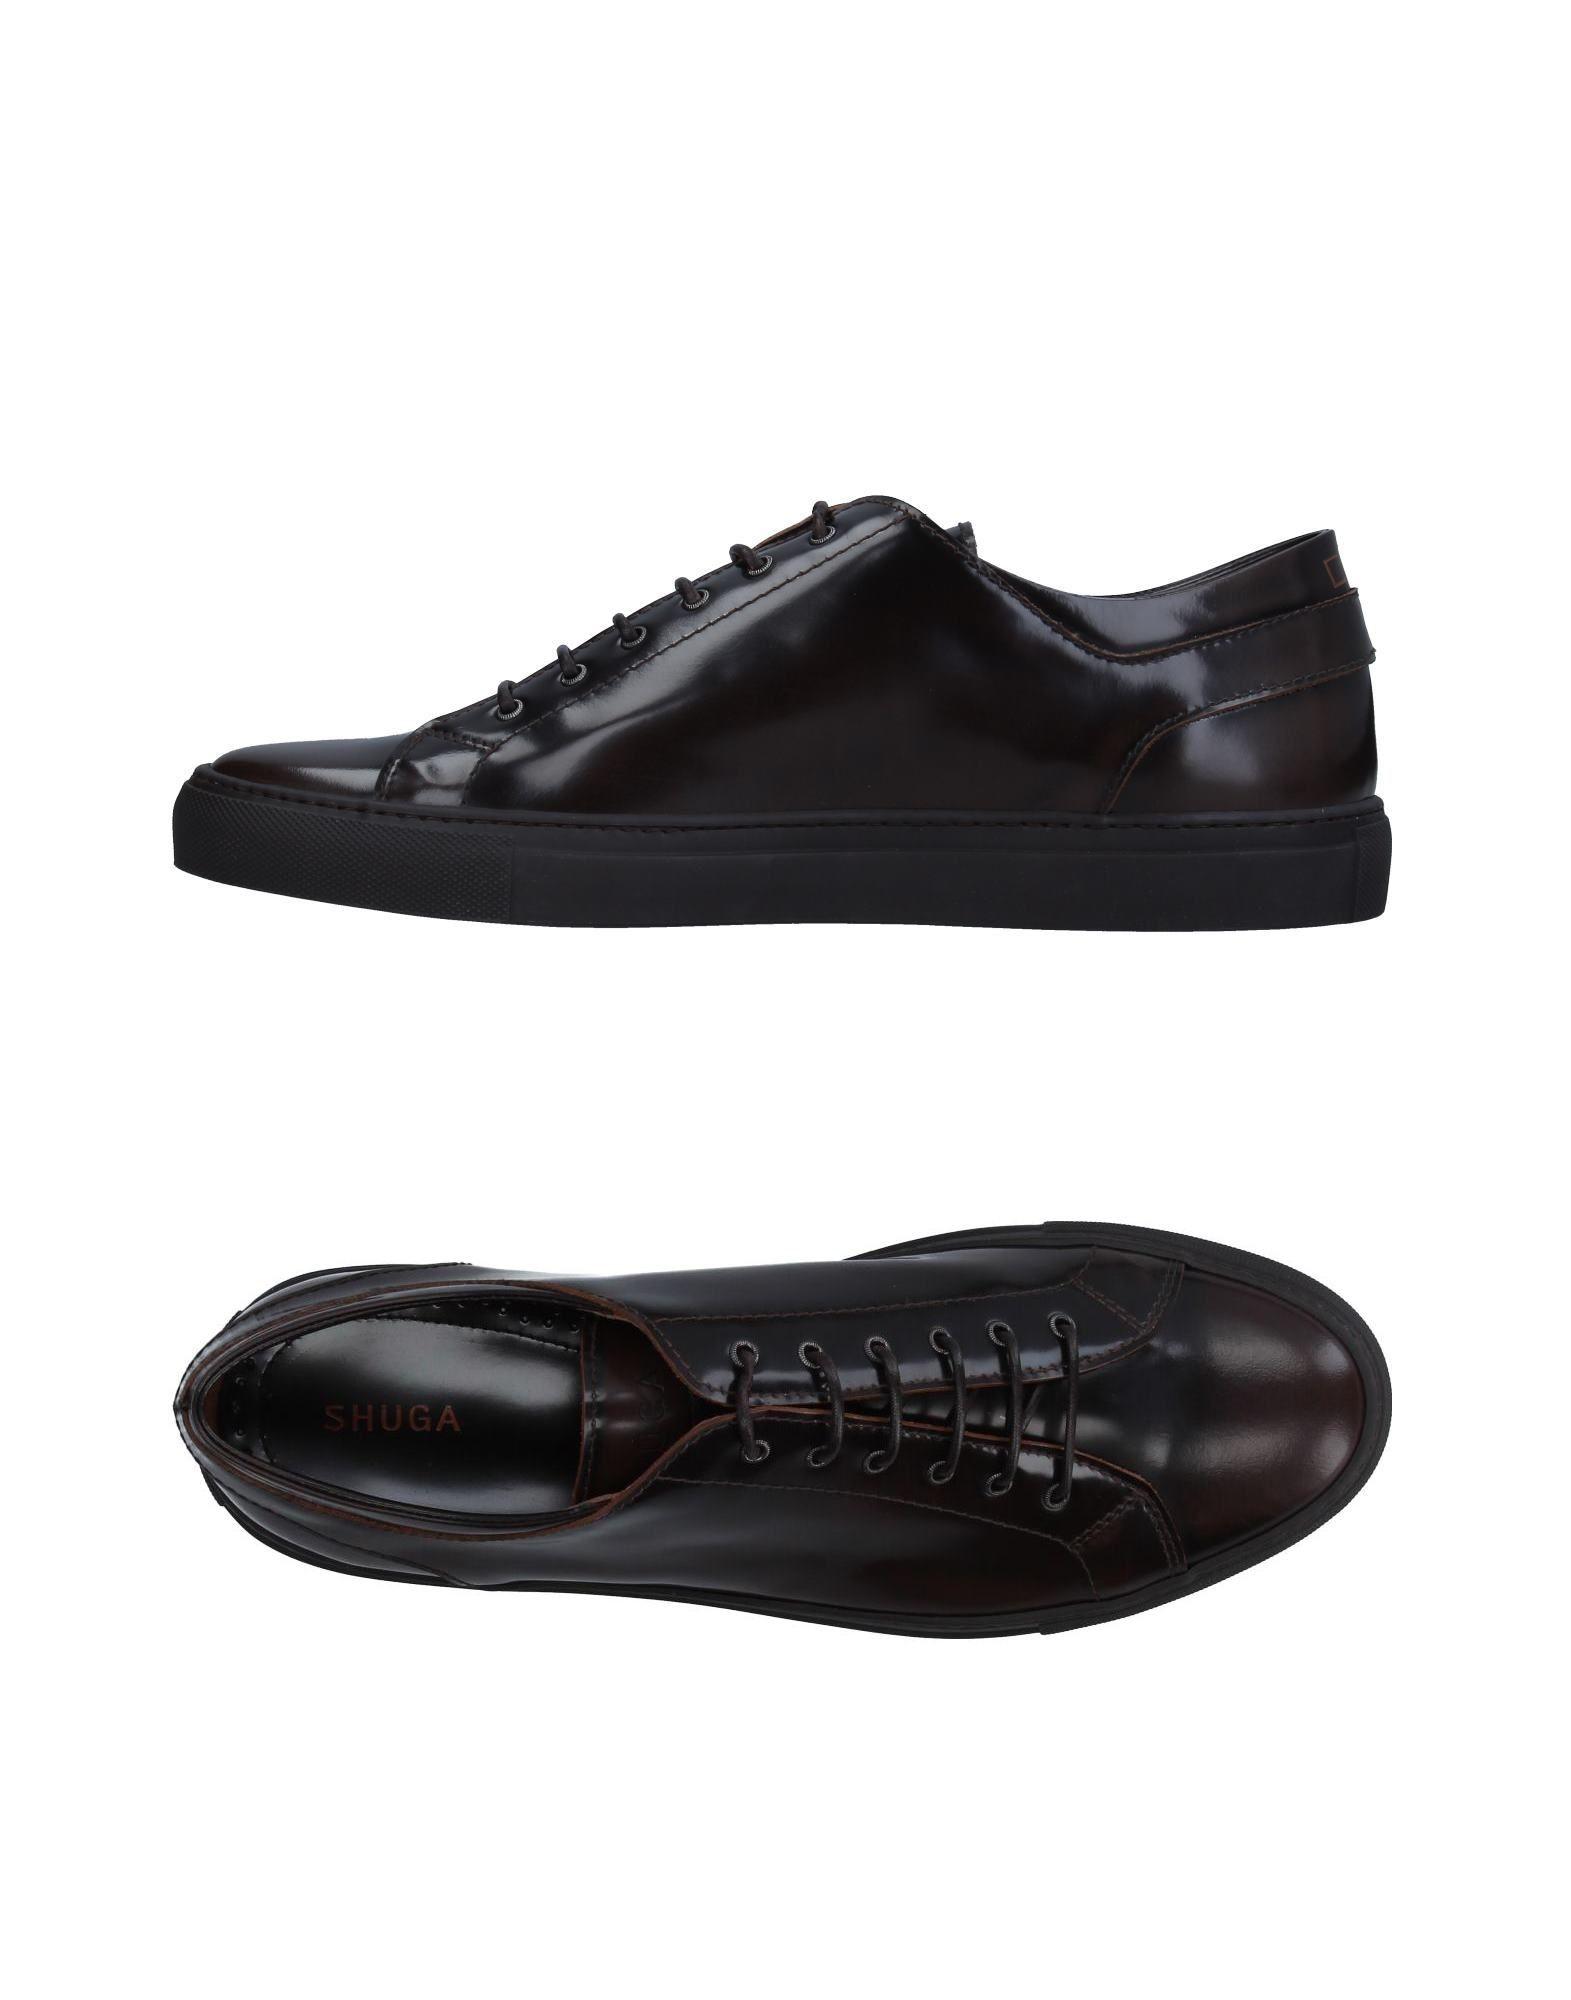 Sneakers Shuga Uomo - Acquista online su